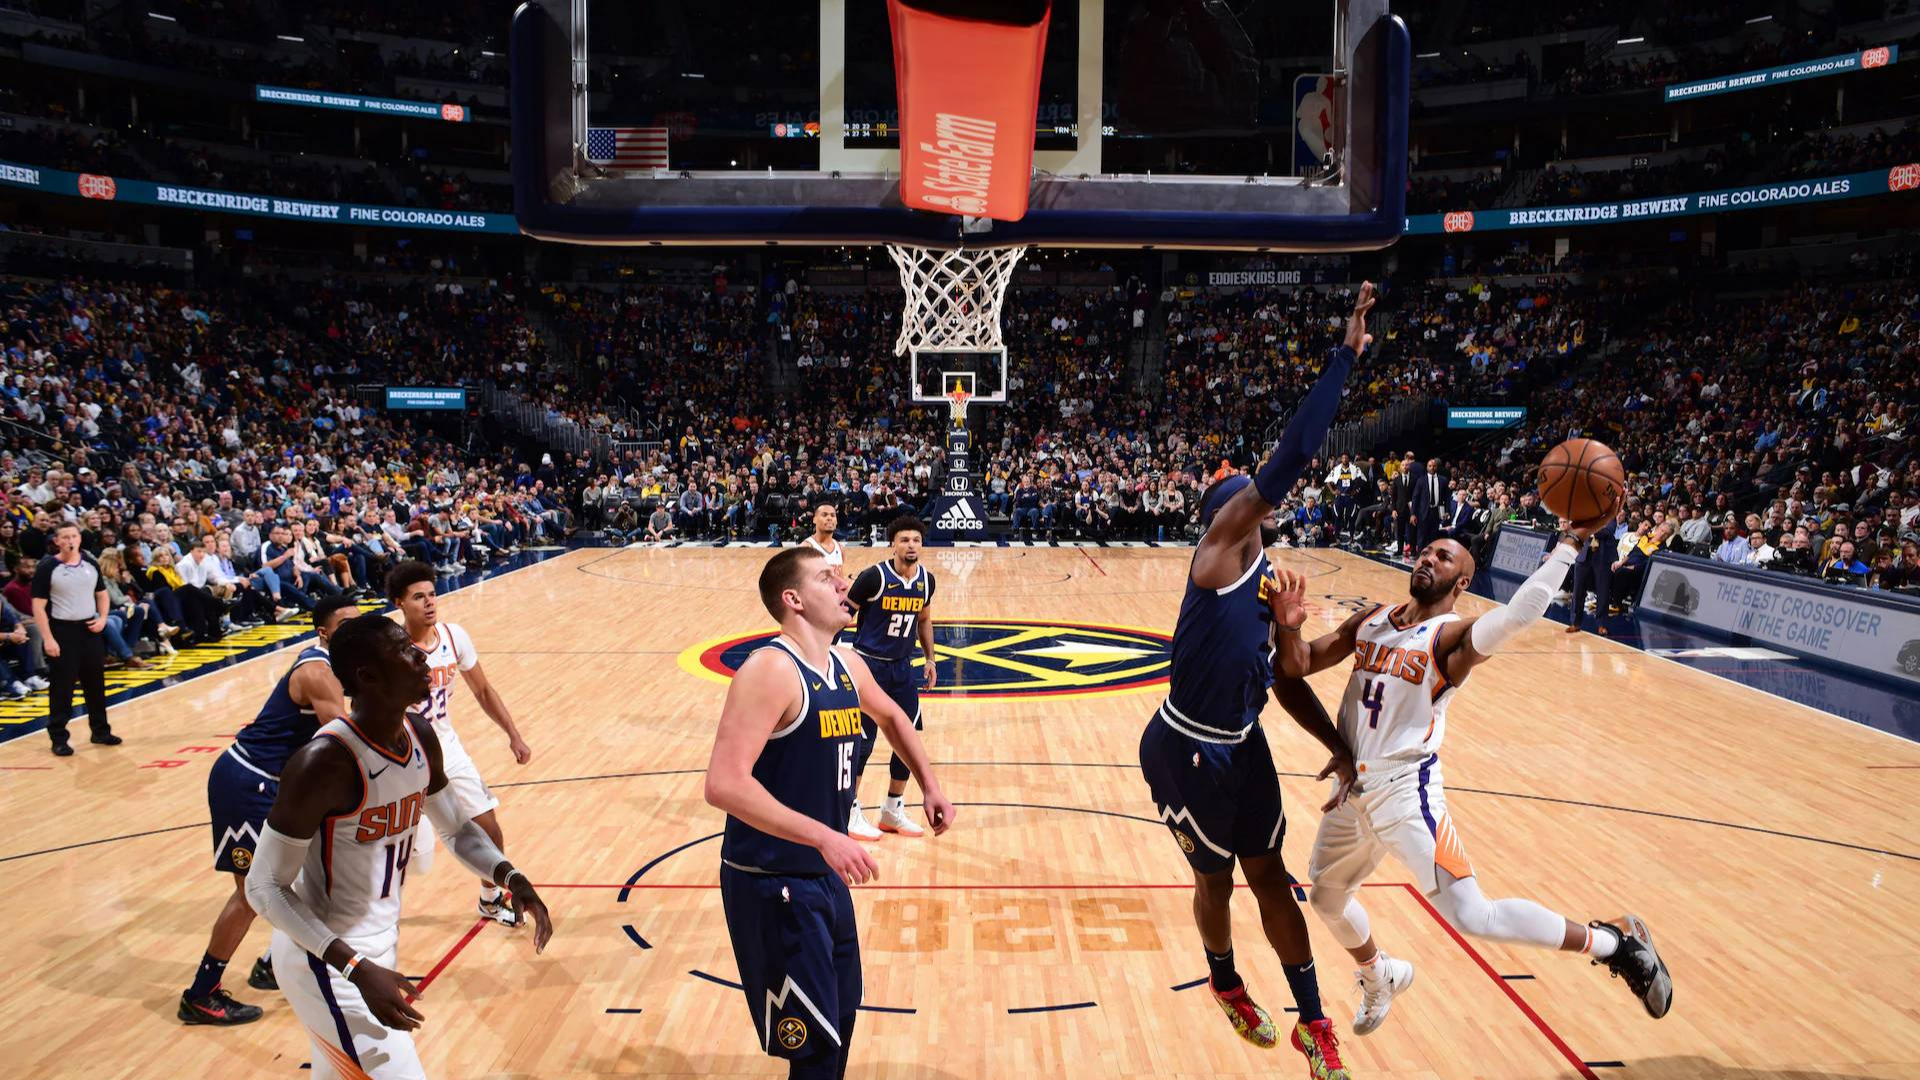 2019-2020 NBA常规赛 丹佛掘金 VS 菲尼克斯太阳 集锦Part1